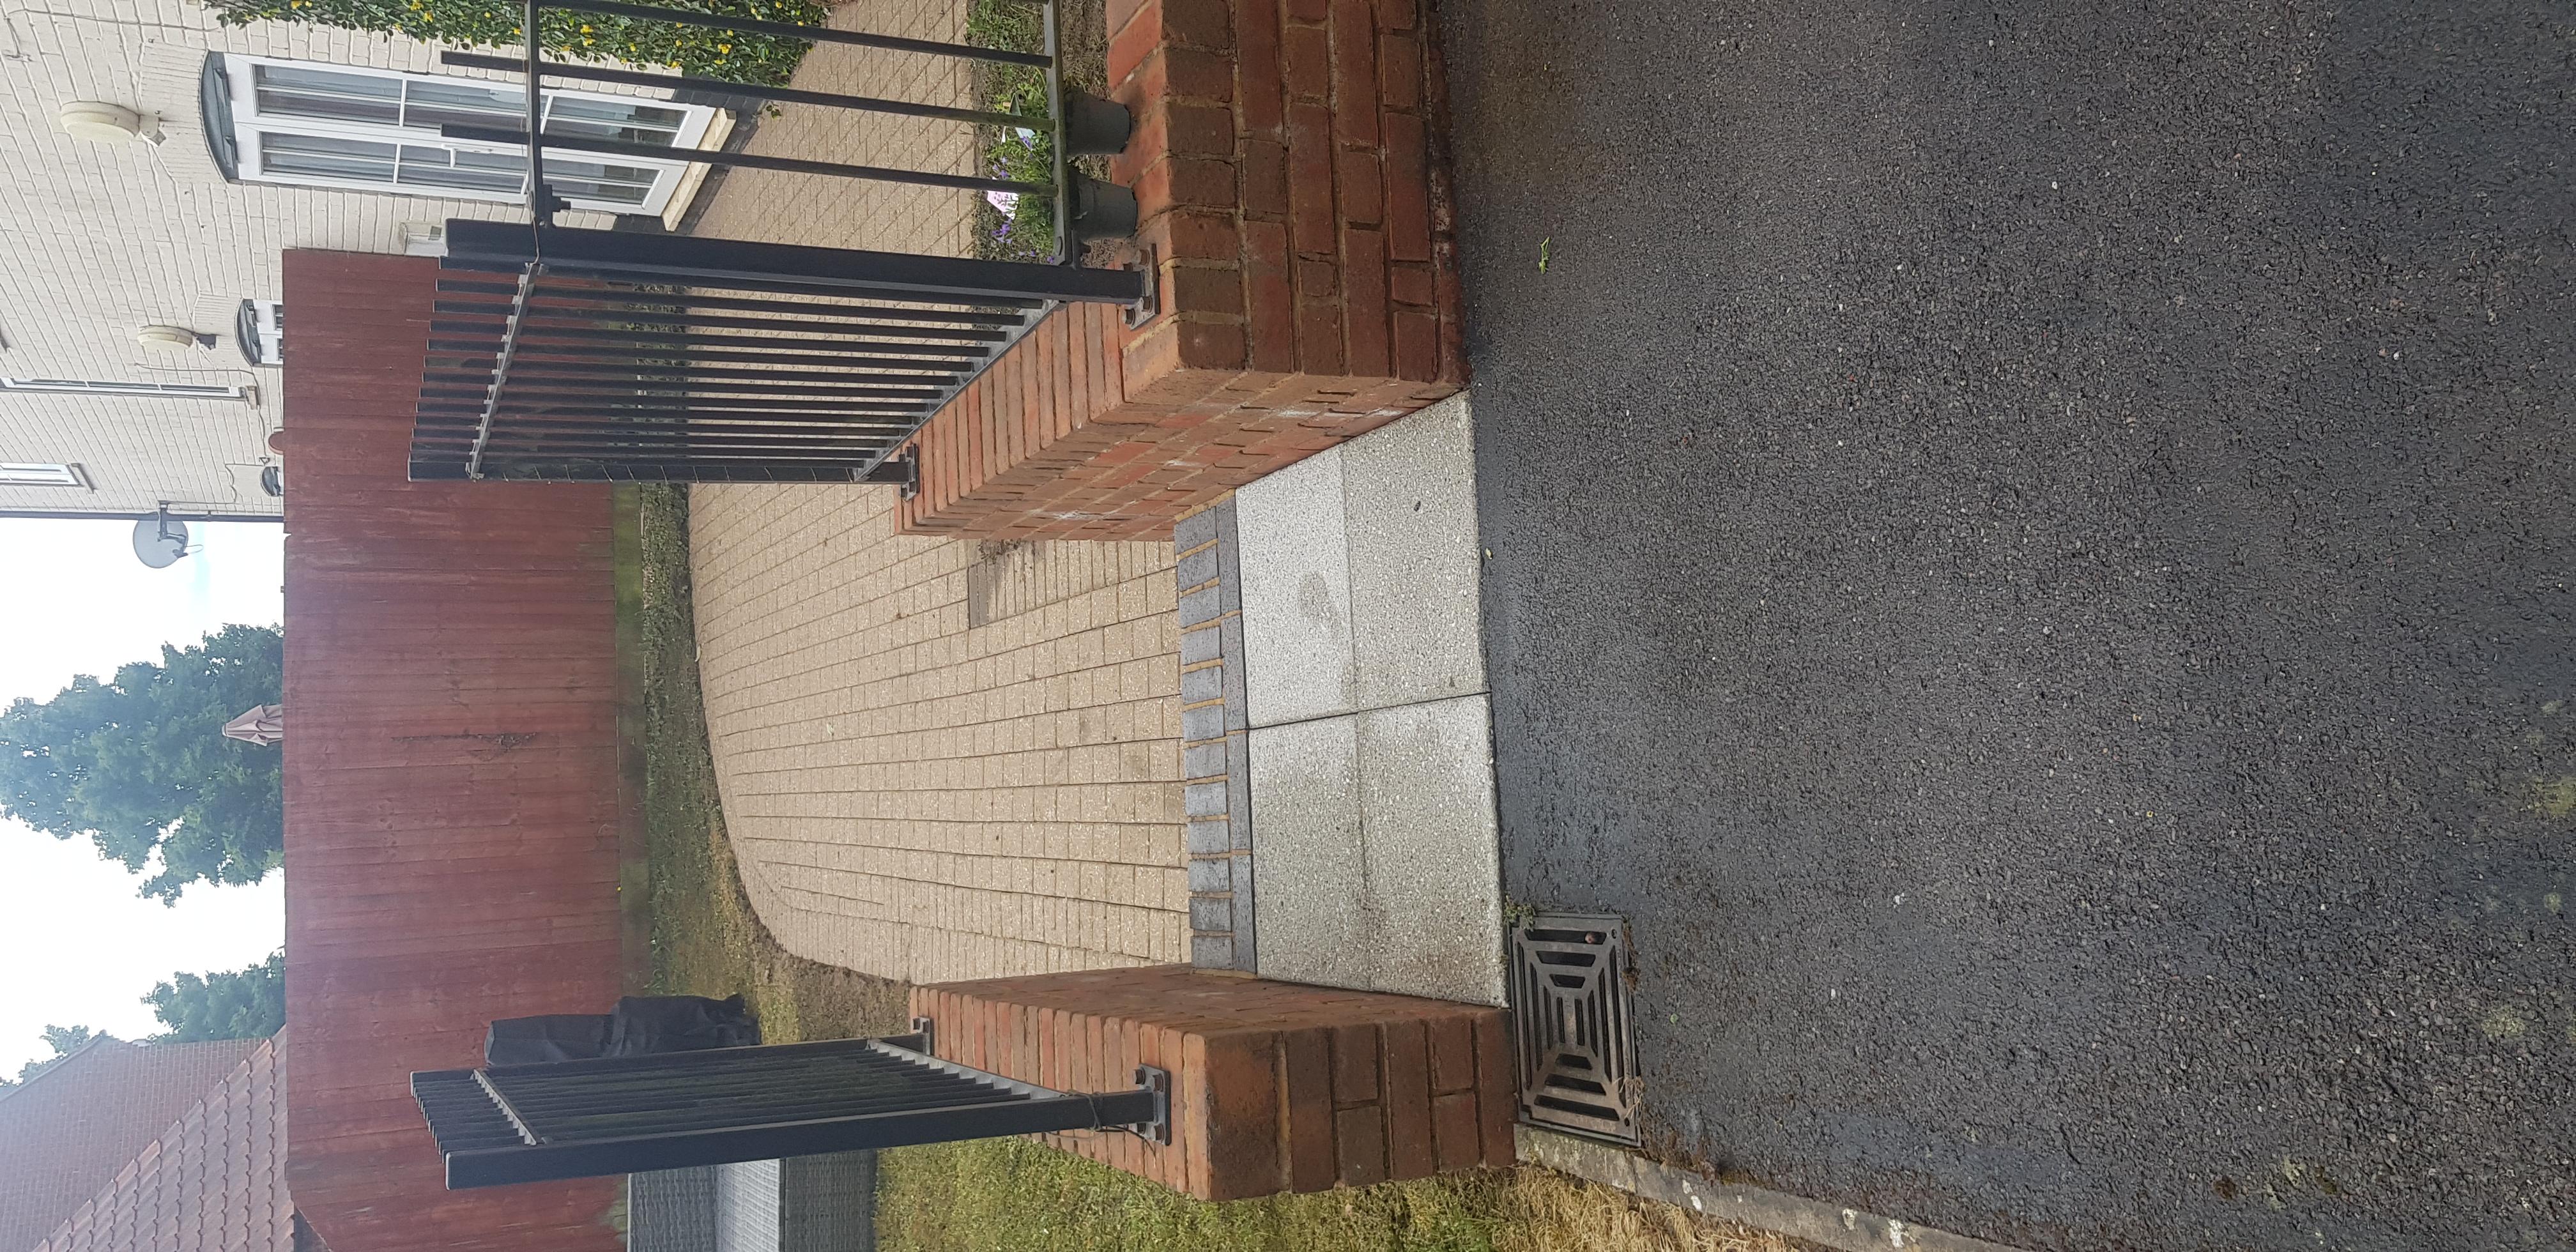 Low Pressure Steam Clean of Block Paving and Brickwork